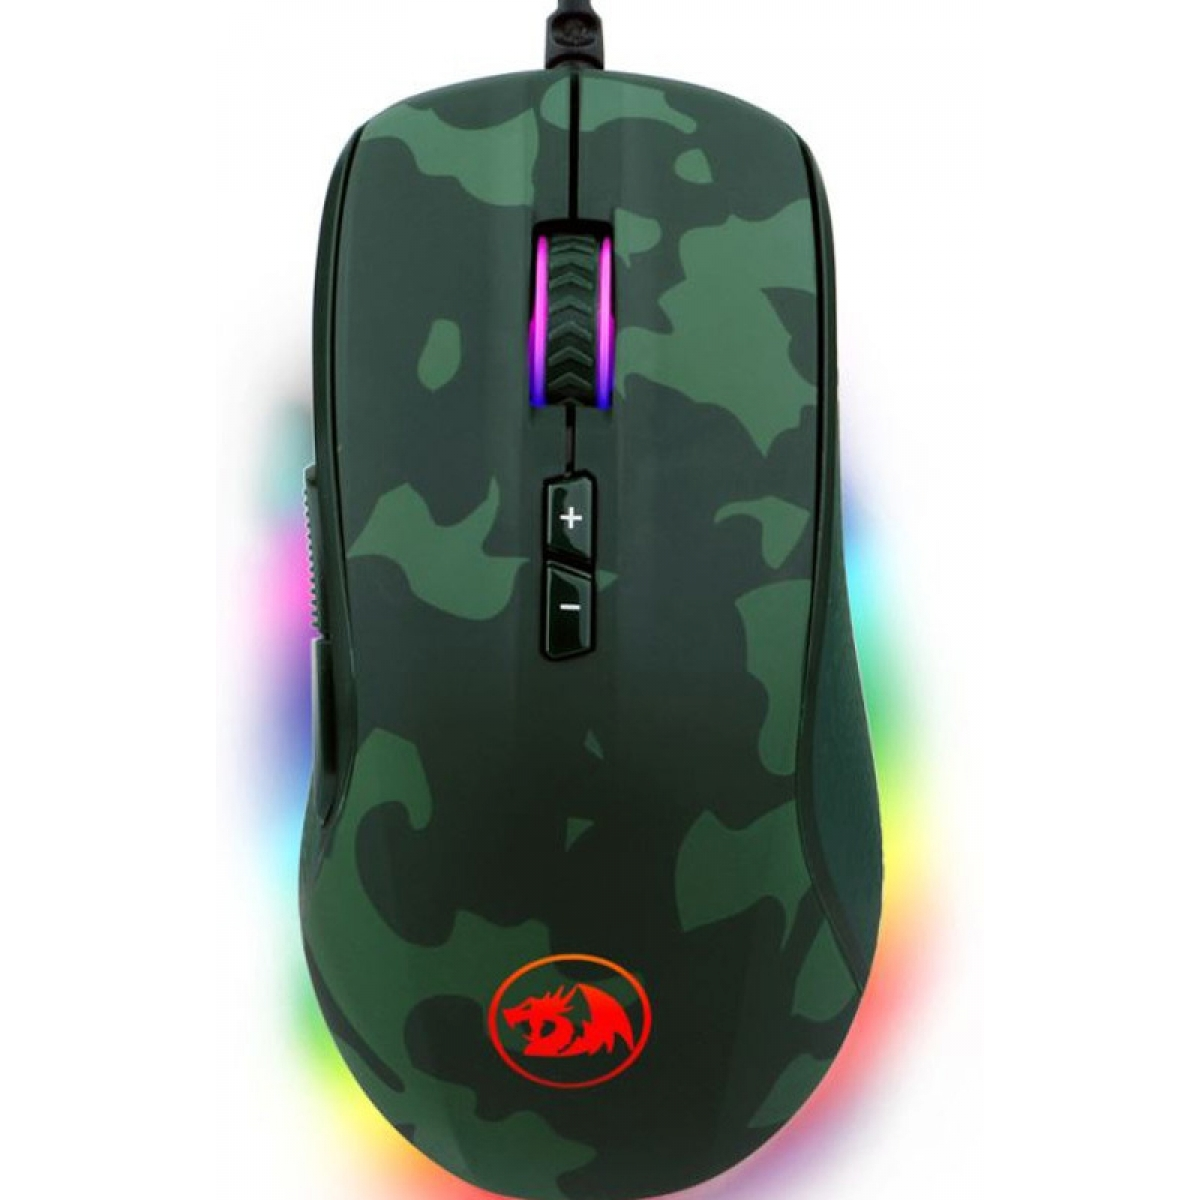 Combo Gamer Redragon, Teclado Mecânico e Mouse Rainbow, Hunter S108